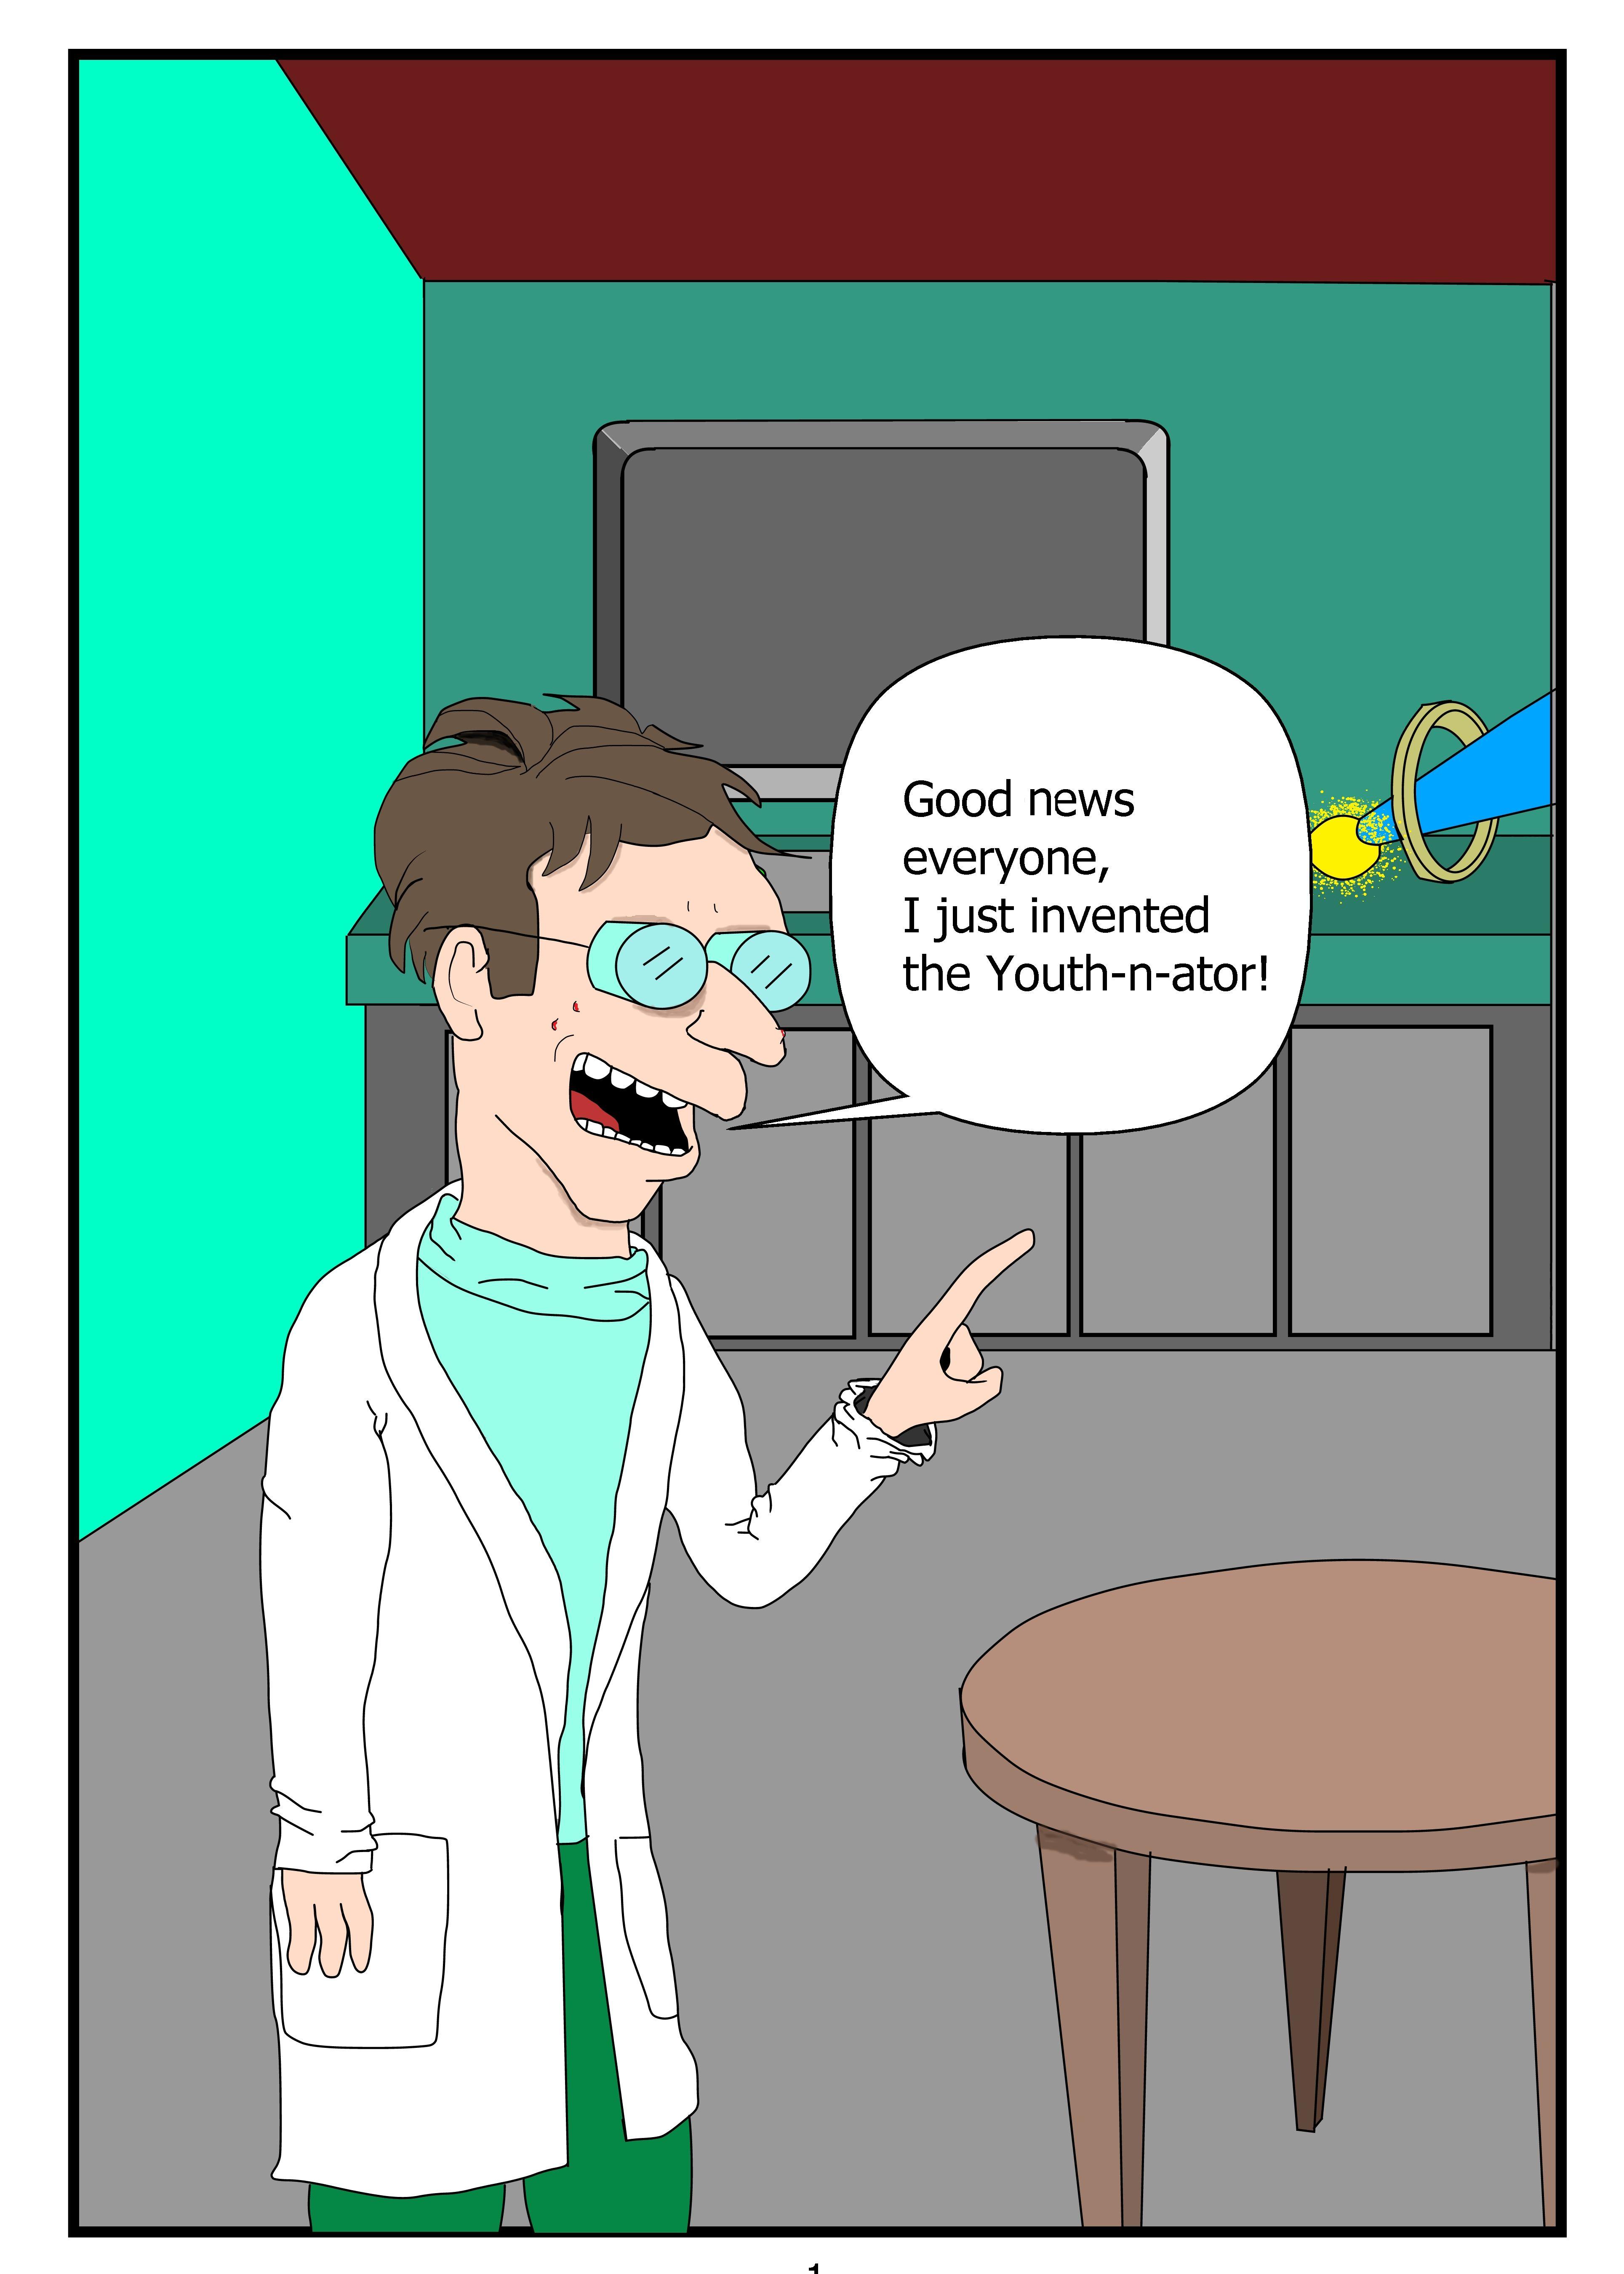 Professor Farnsworth invents a youth ray gun